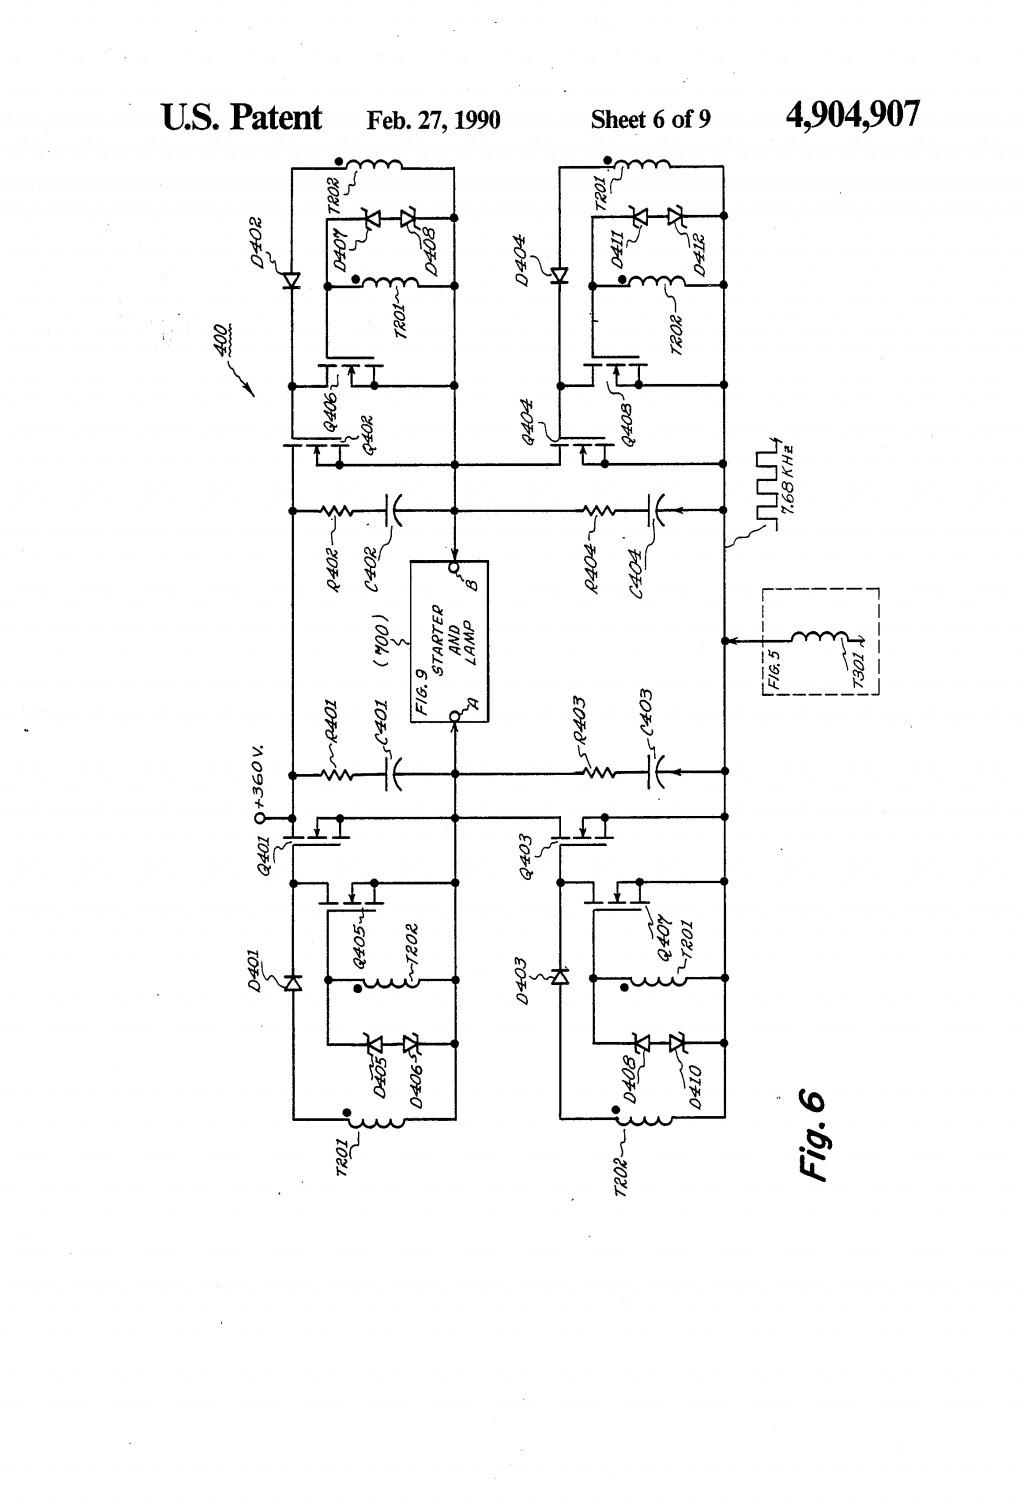 175 Watt Metal Halide Ballast Wiring Diagram